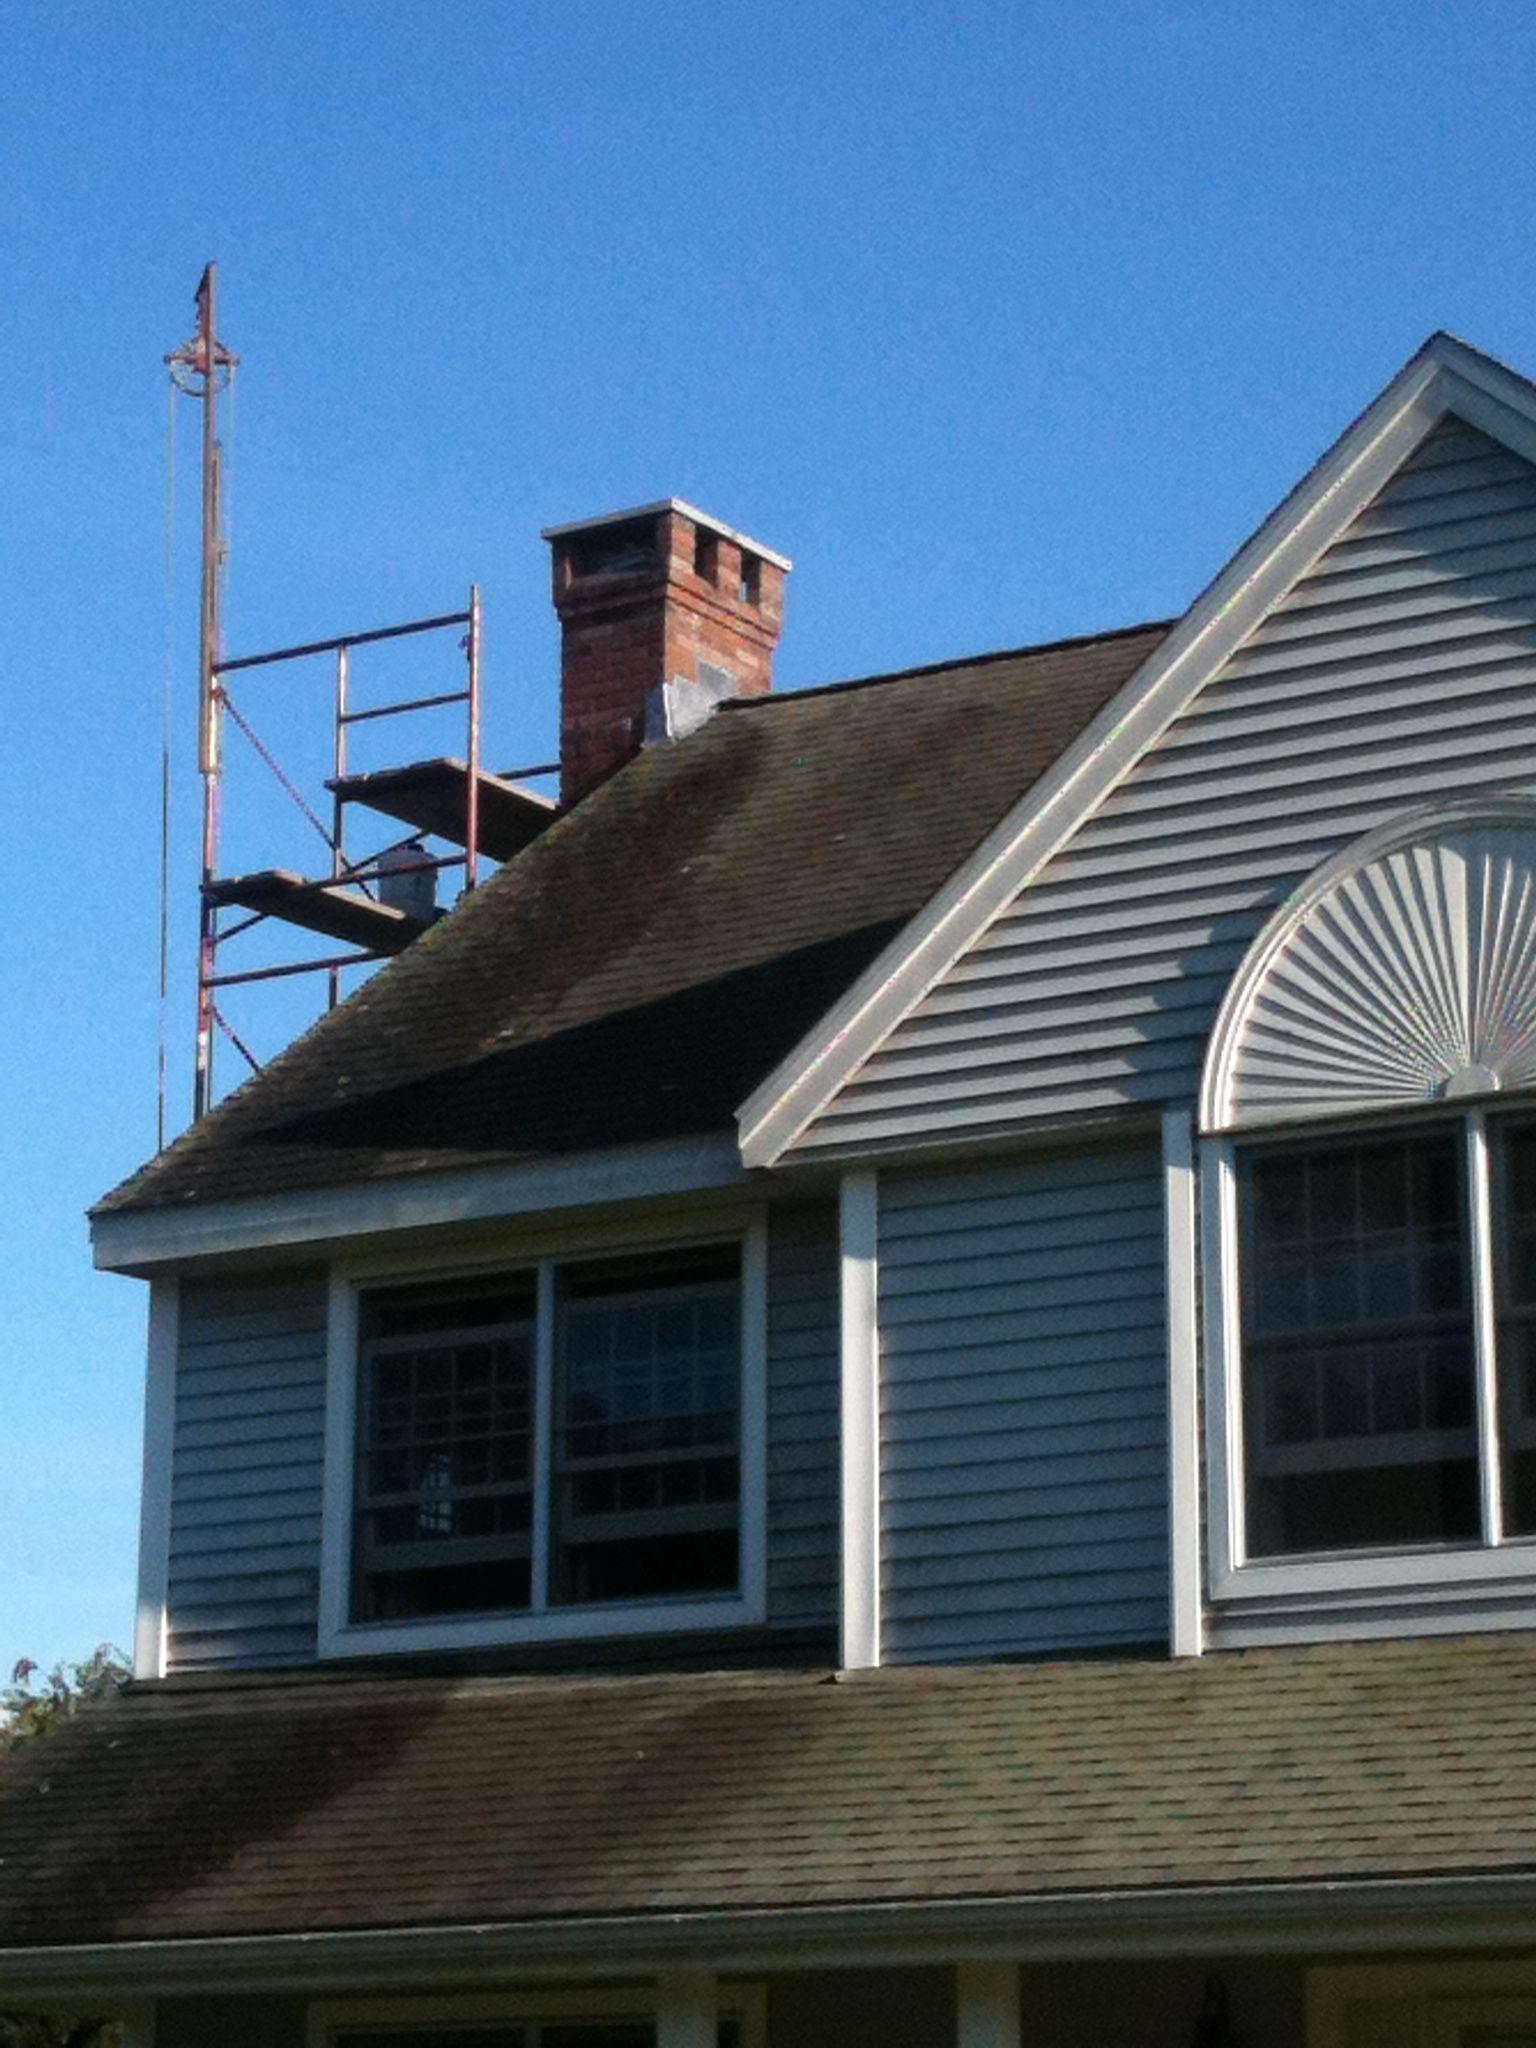 chimney repair with bluestone chimney repairs pinterest house